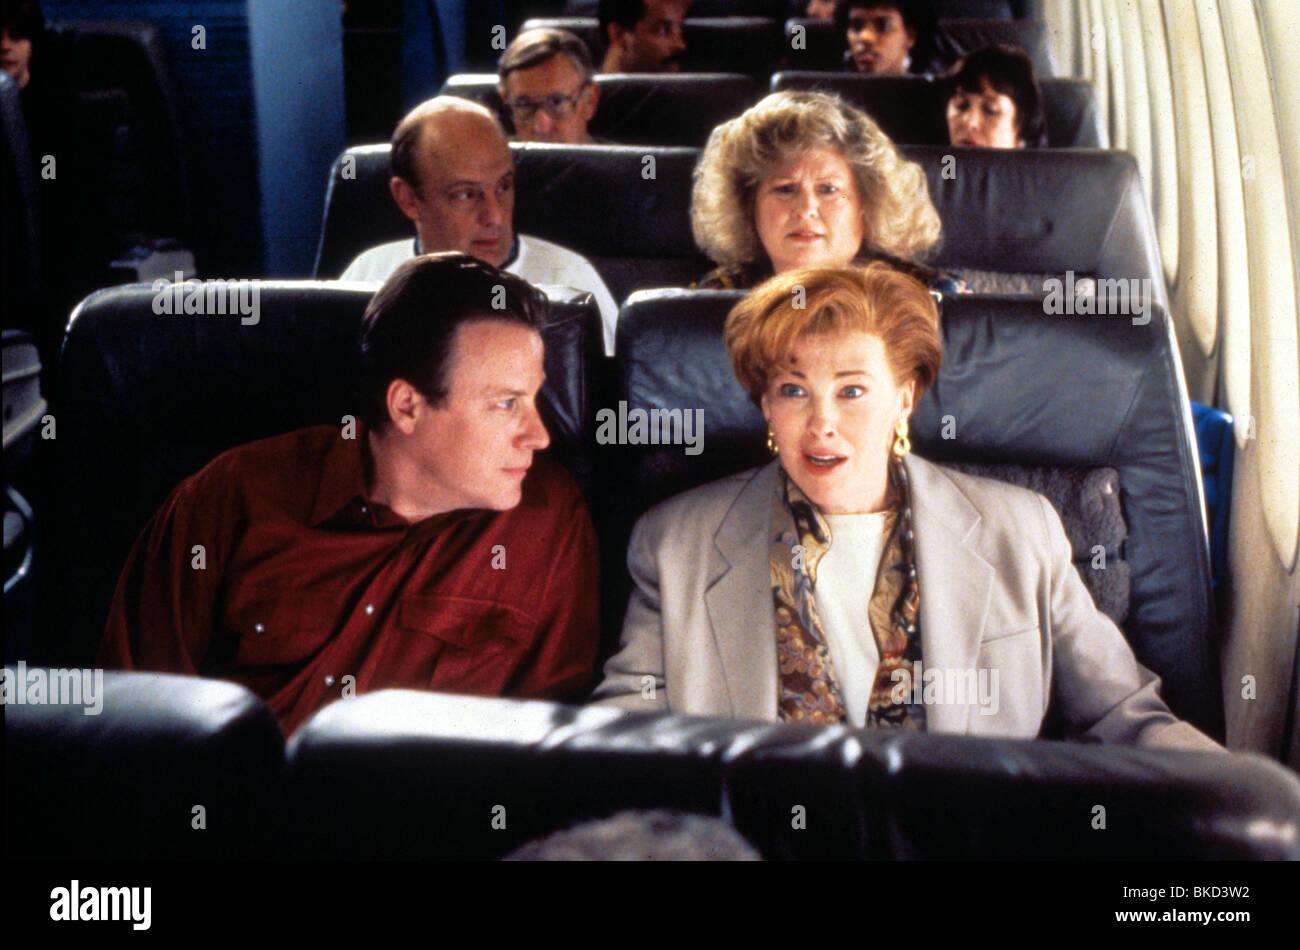 Home Alone 2 Lost In New York 1992 John Heard Catharine O Hara Stock Photo Alamy